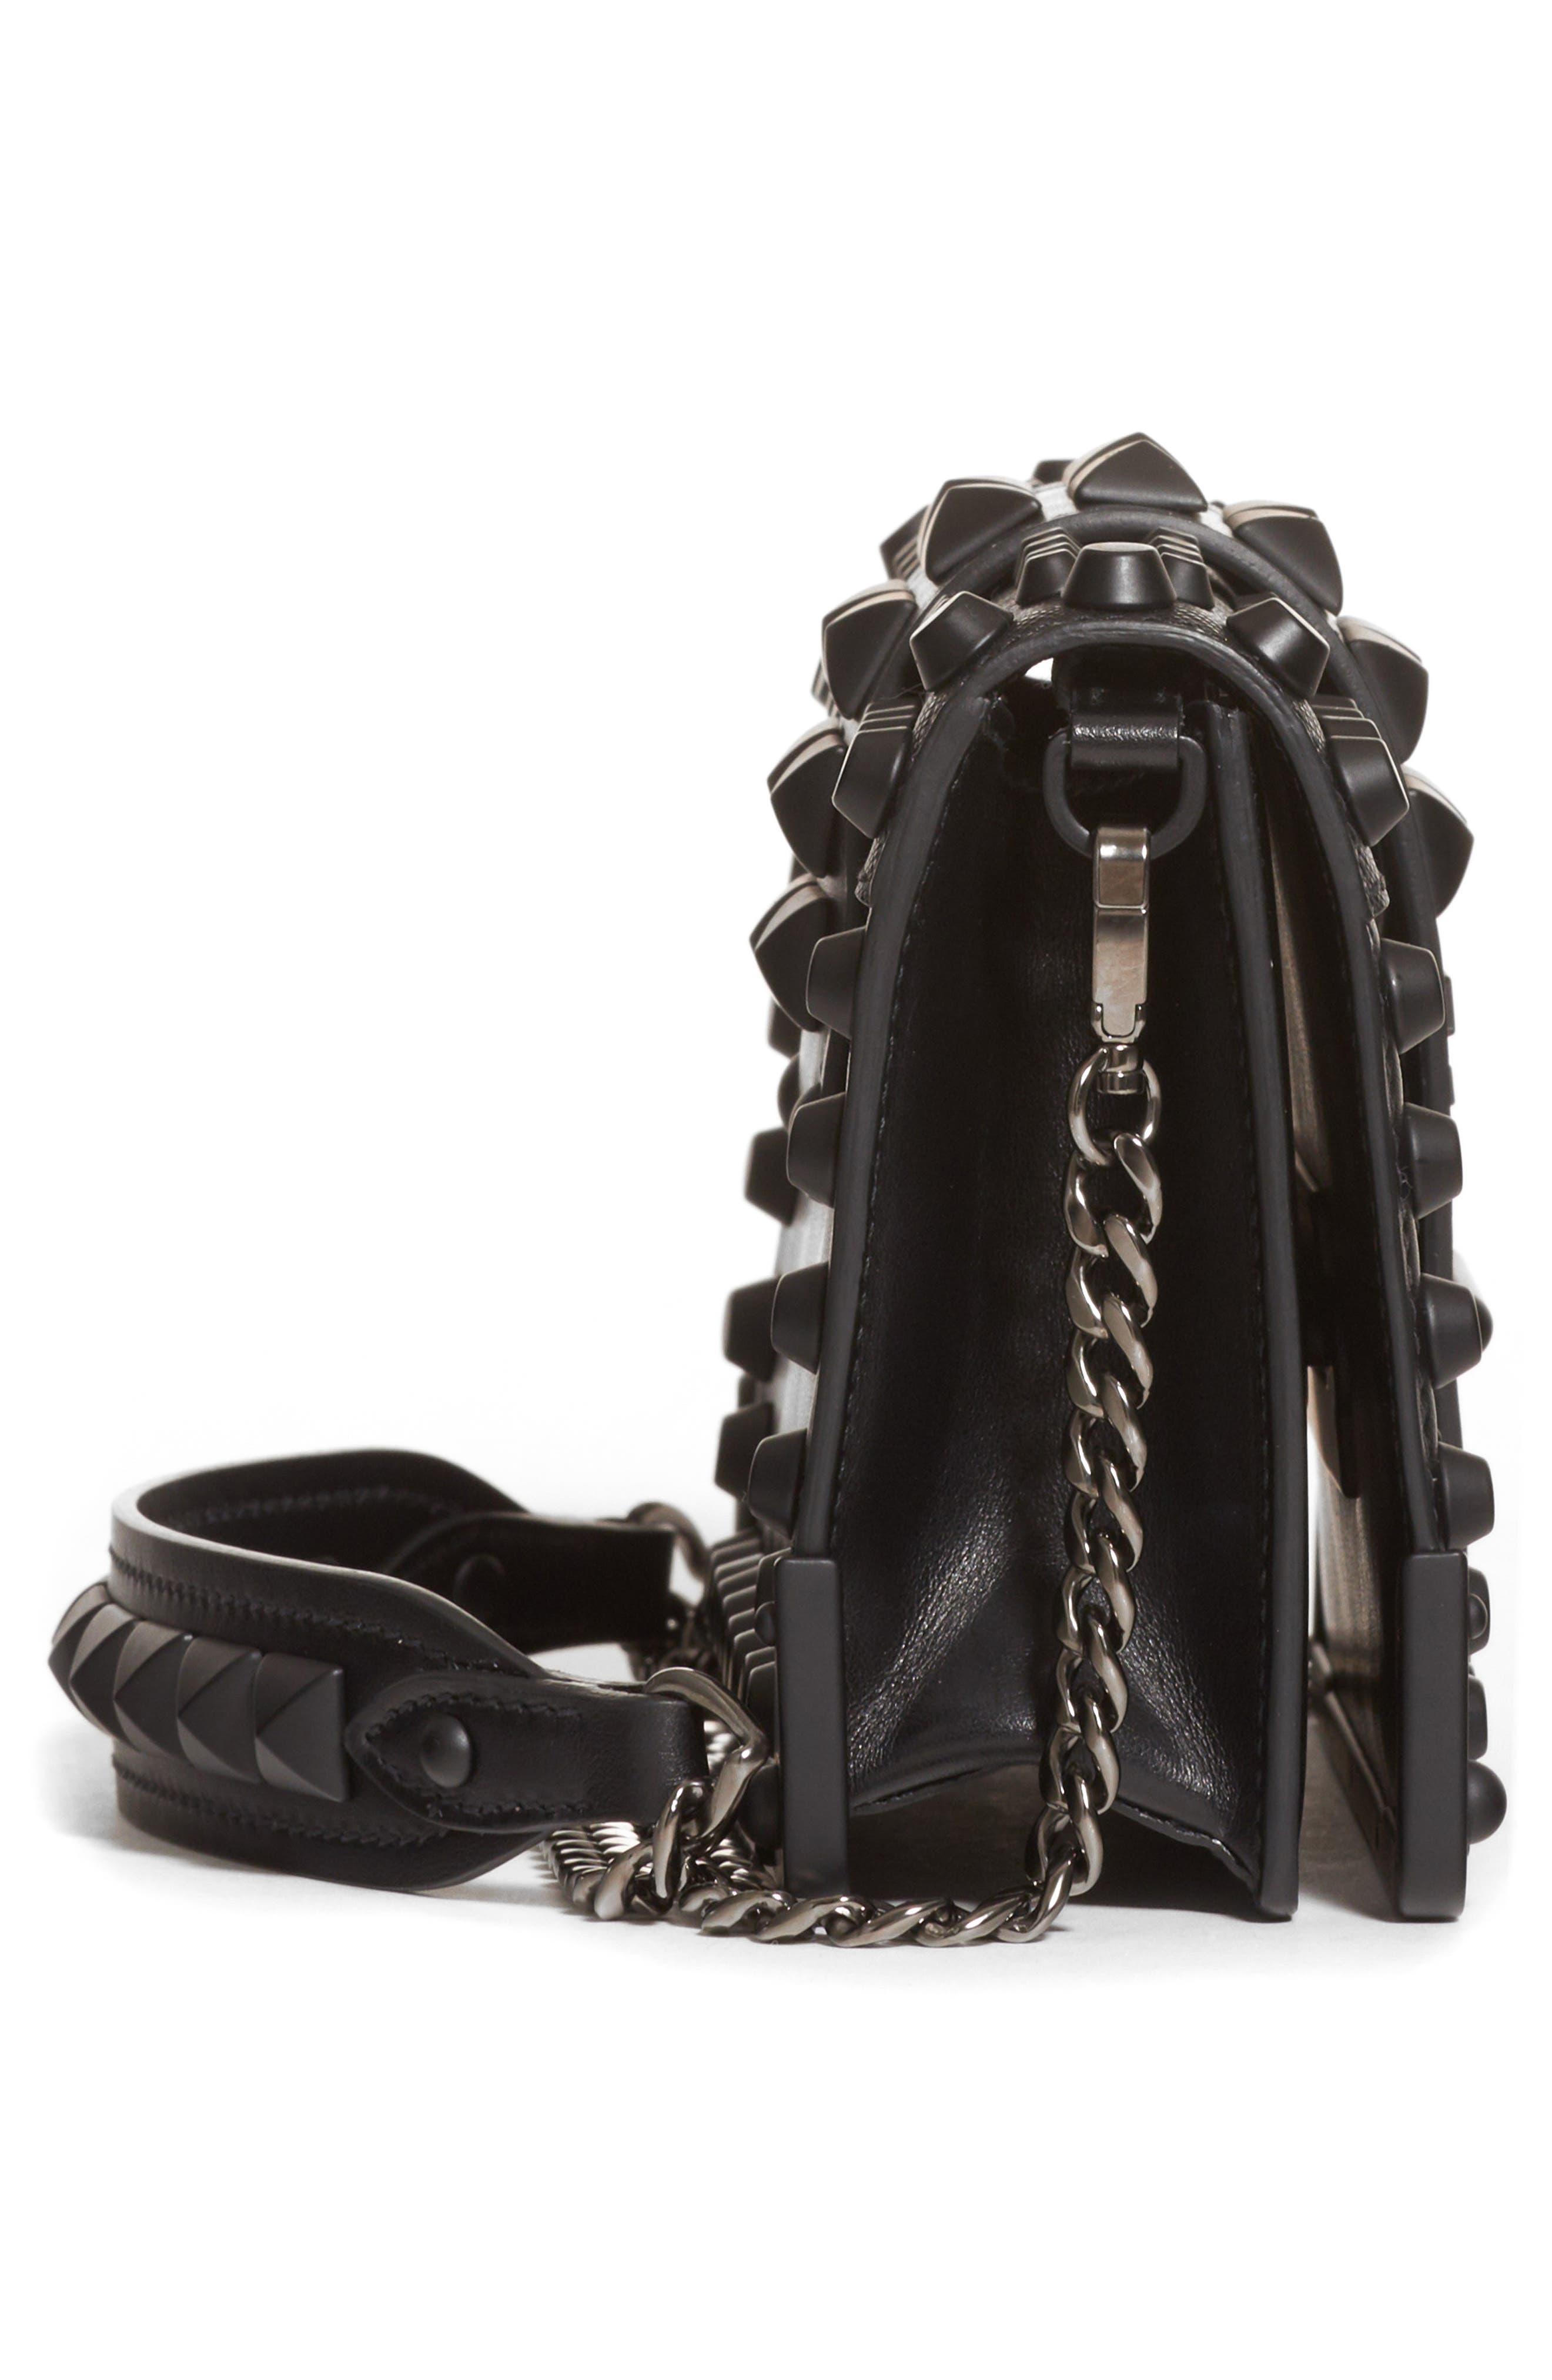 PRADA,                             Cahier Studded Leather Crossbody Bag,                             Alternate thumbnail 4, color,                             NERO/ NERO